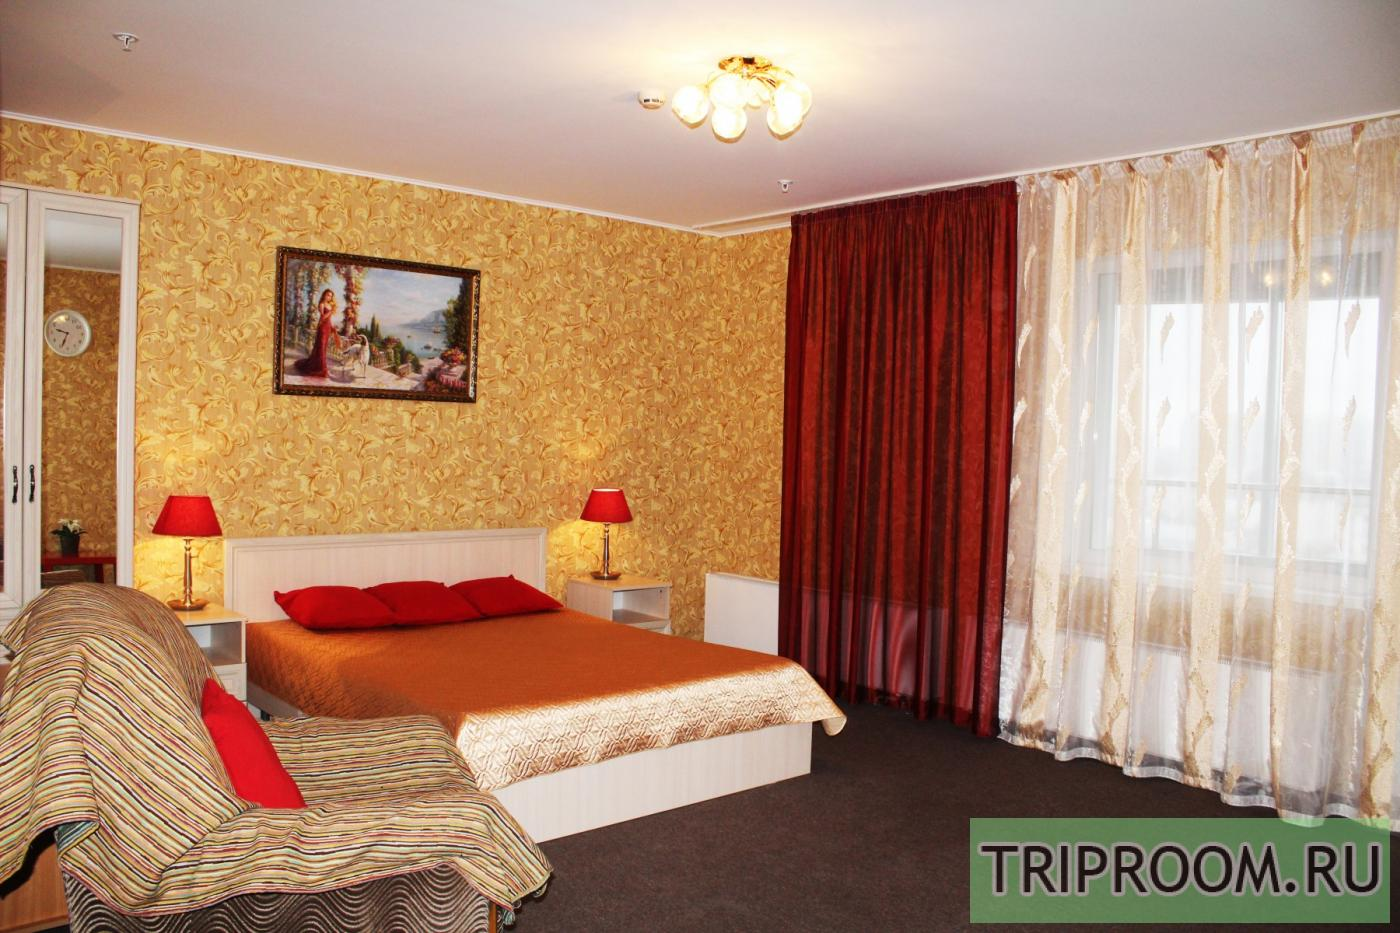 1-комнатная квартира посуточно (вариант № 35144), ул. Гагарина бульвар, фото № 1